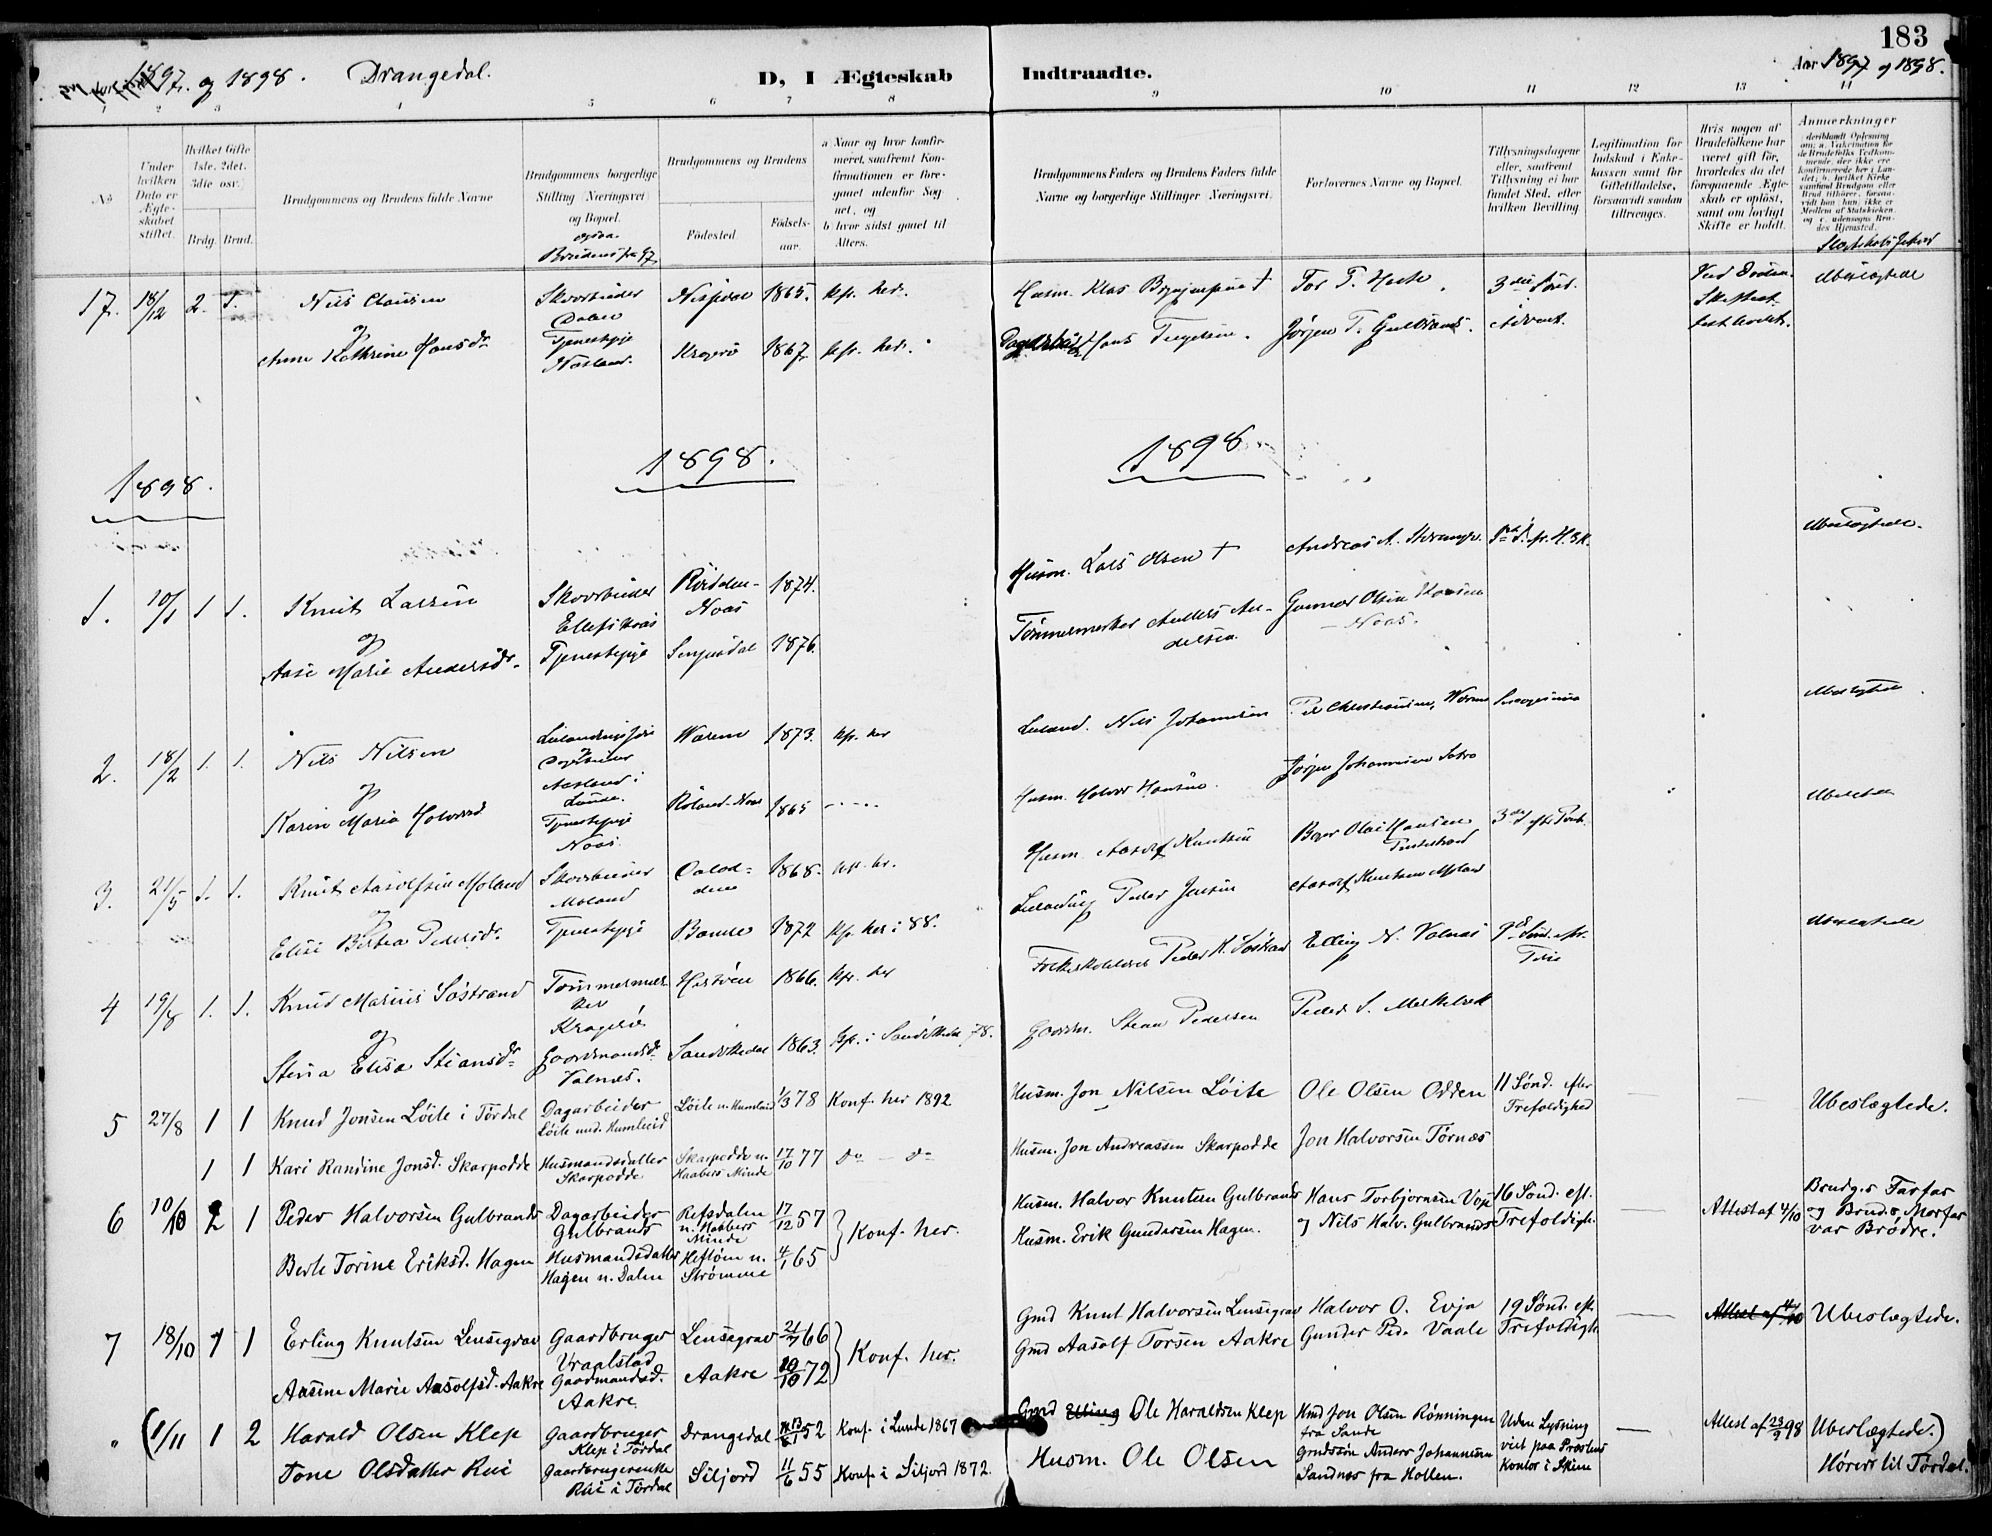 SAKO, Drangedal kirkebøker, F/Fa/L0012: Ministerialbok nr. 12, 1895-1905, s. 183